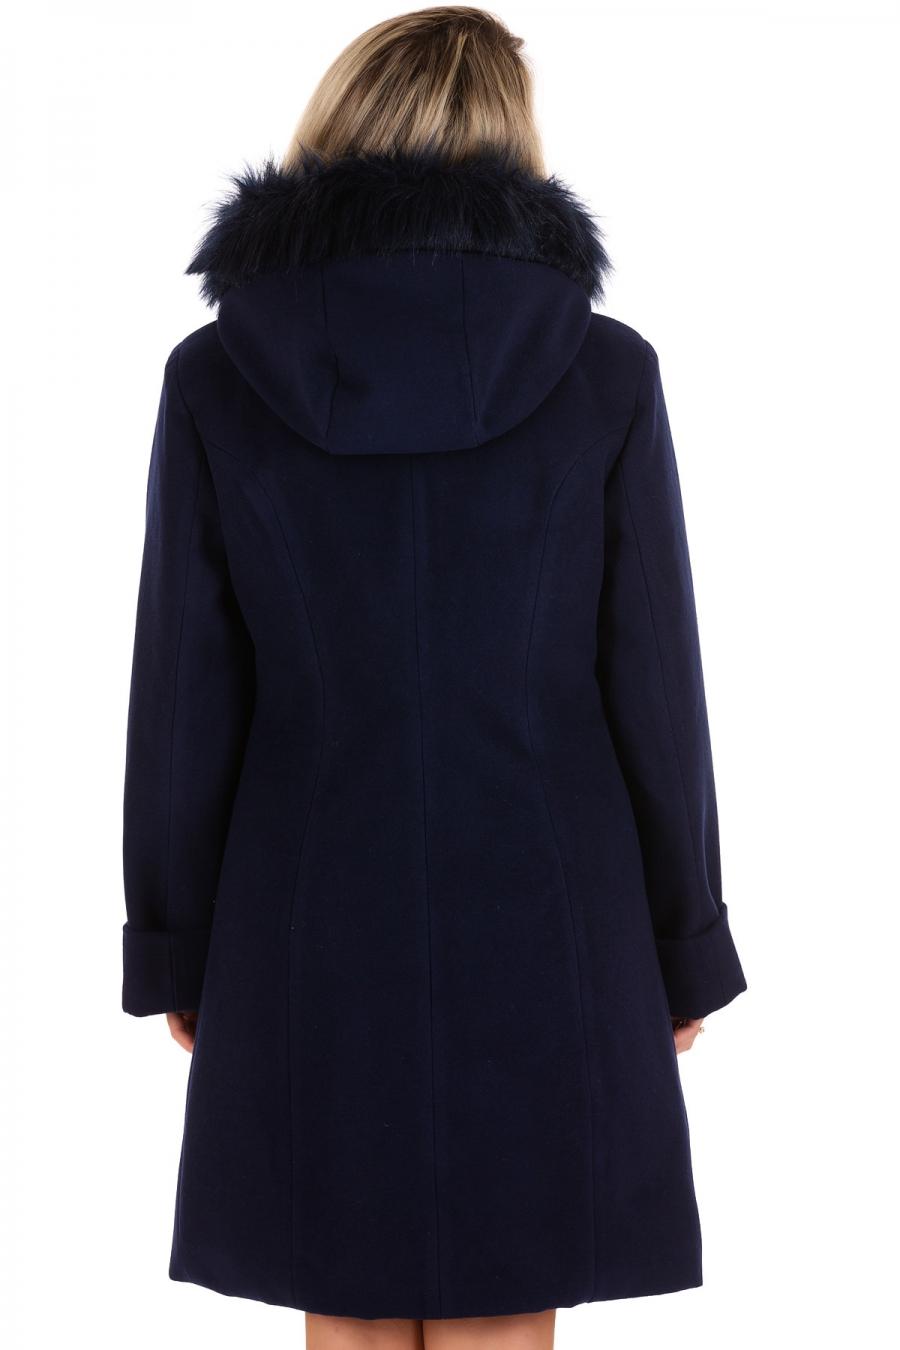 Palton Dalia Bleumarin